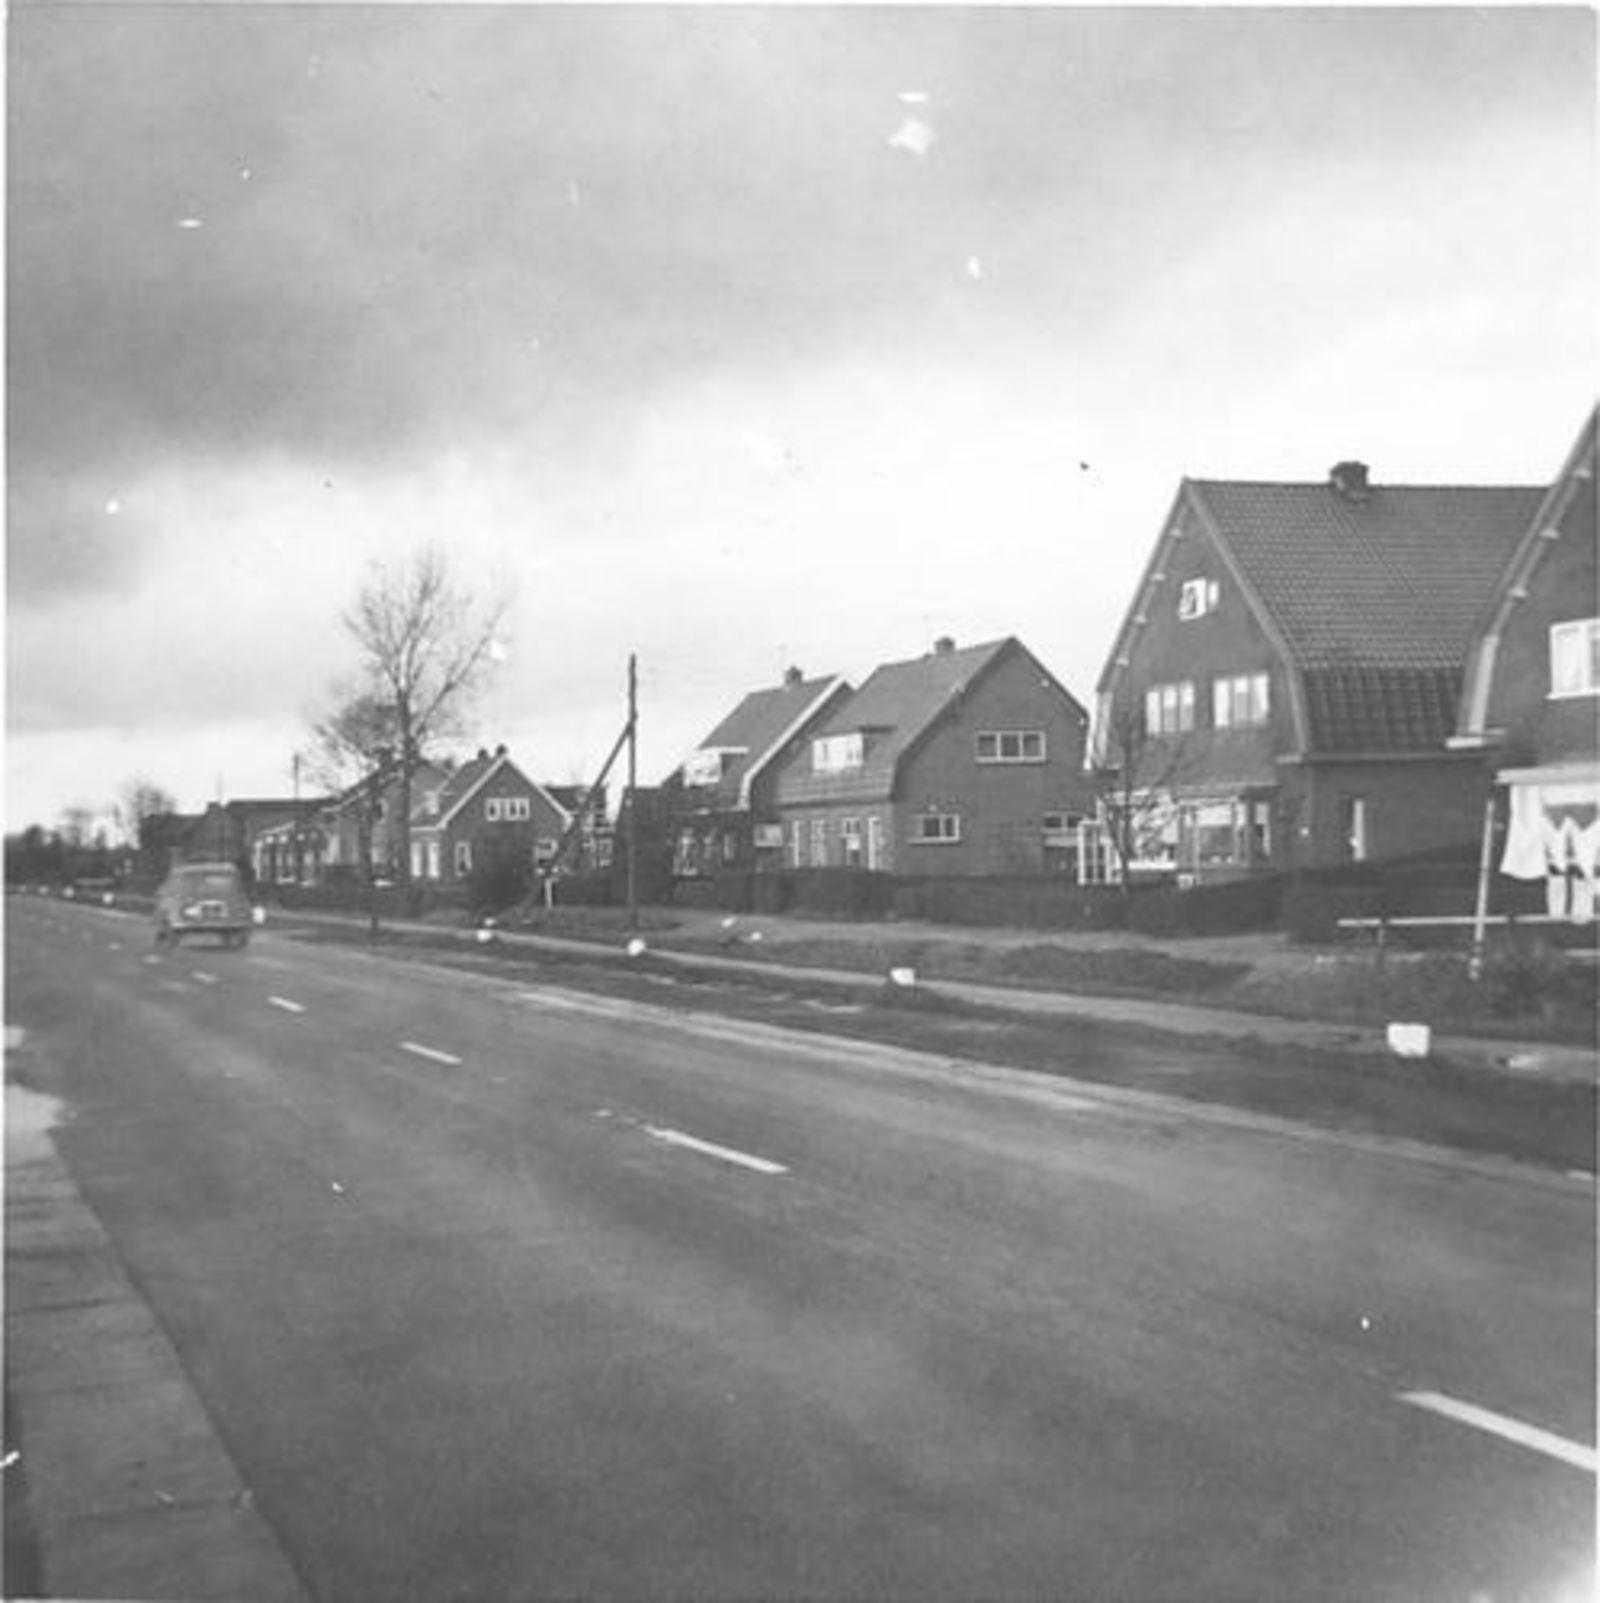 Kruisweg N 1567ev 1960± Huize Huurman ev